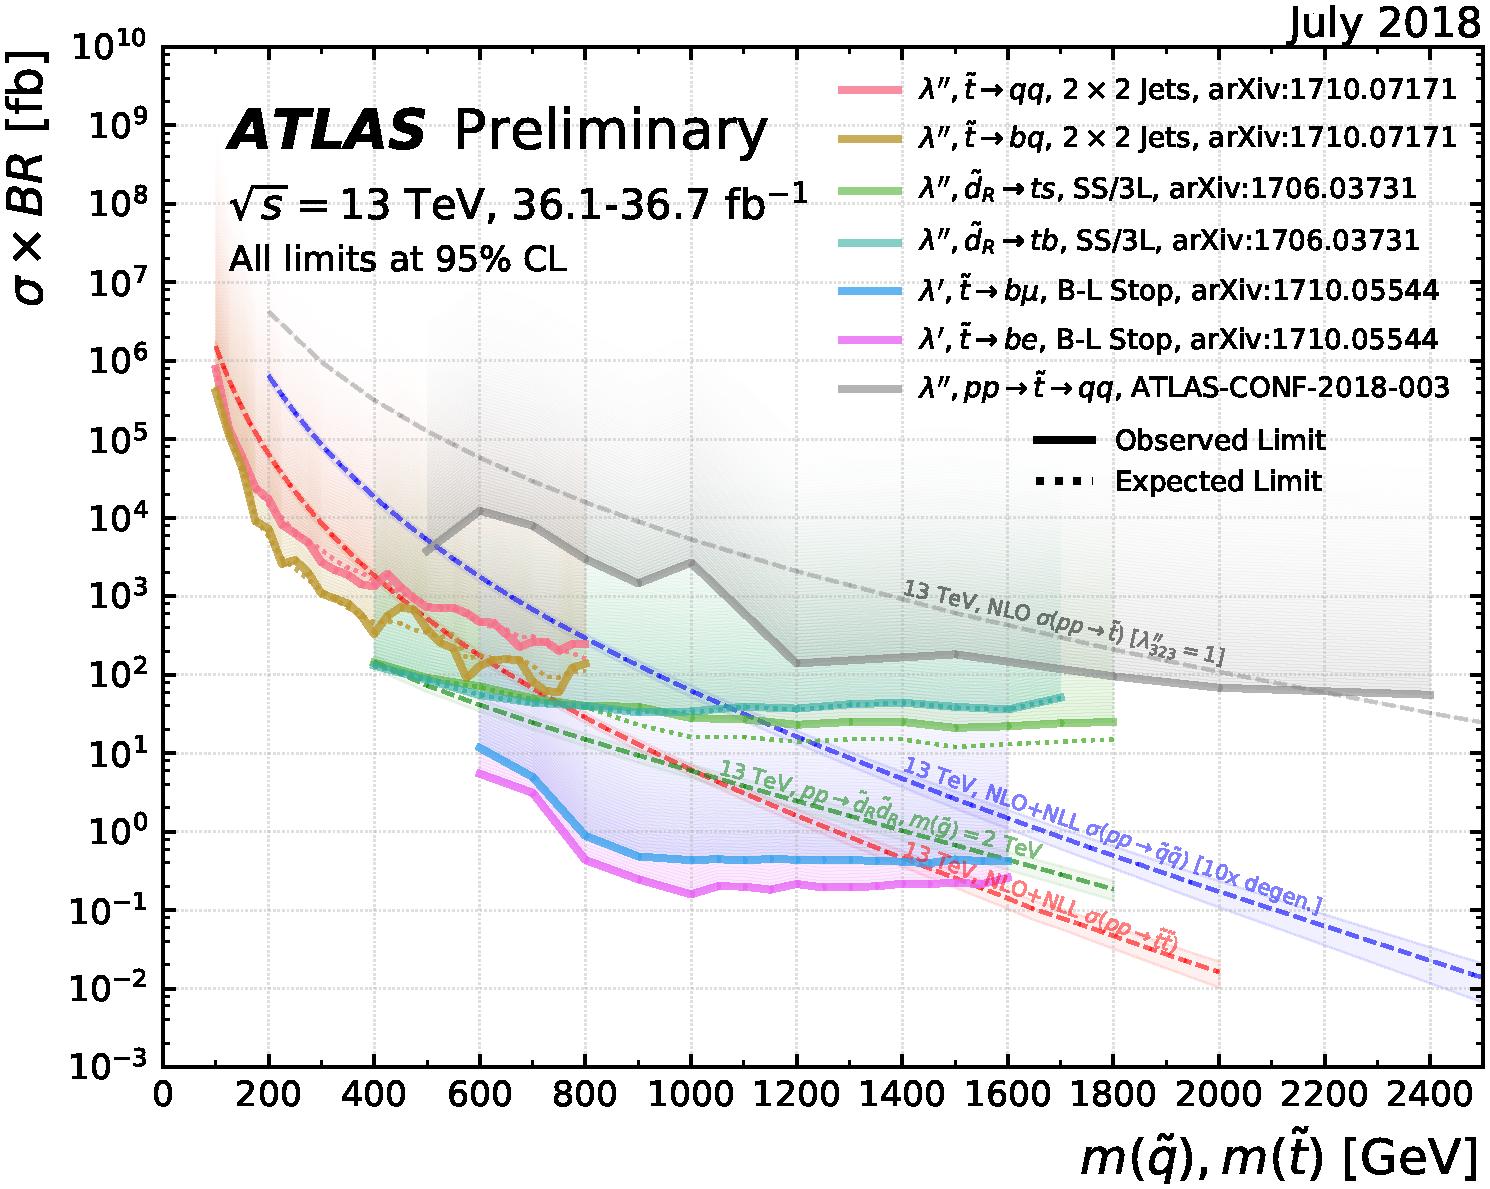 https://atlas.web.cern.ch/Atlas/GROUPS/PHYSICS/CombinedSummaryPlots/SUSY/ATLAS_SUSY_RPV_squark/ATLAS_SUSY_RPV_squark.png